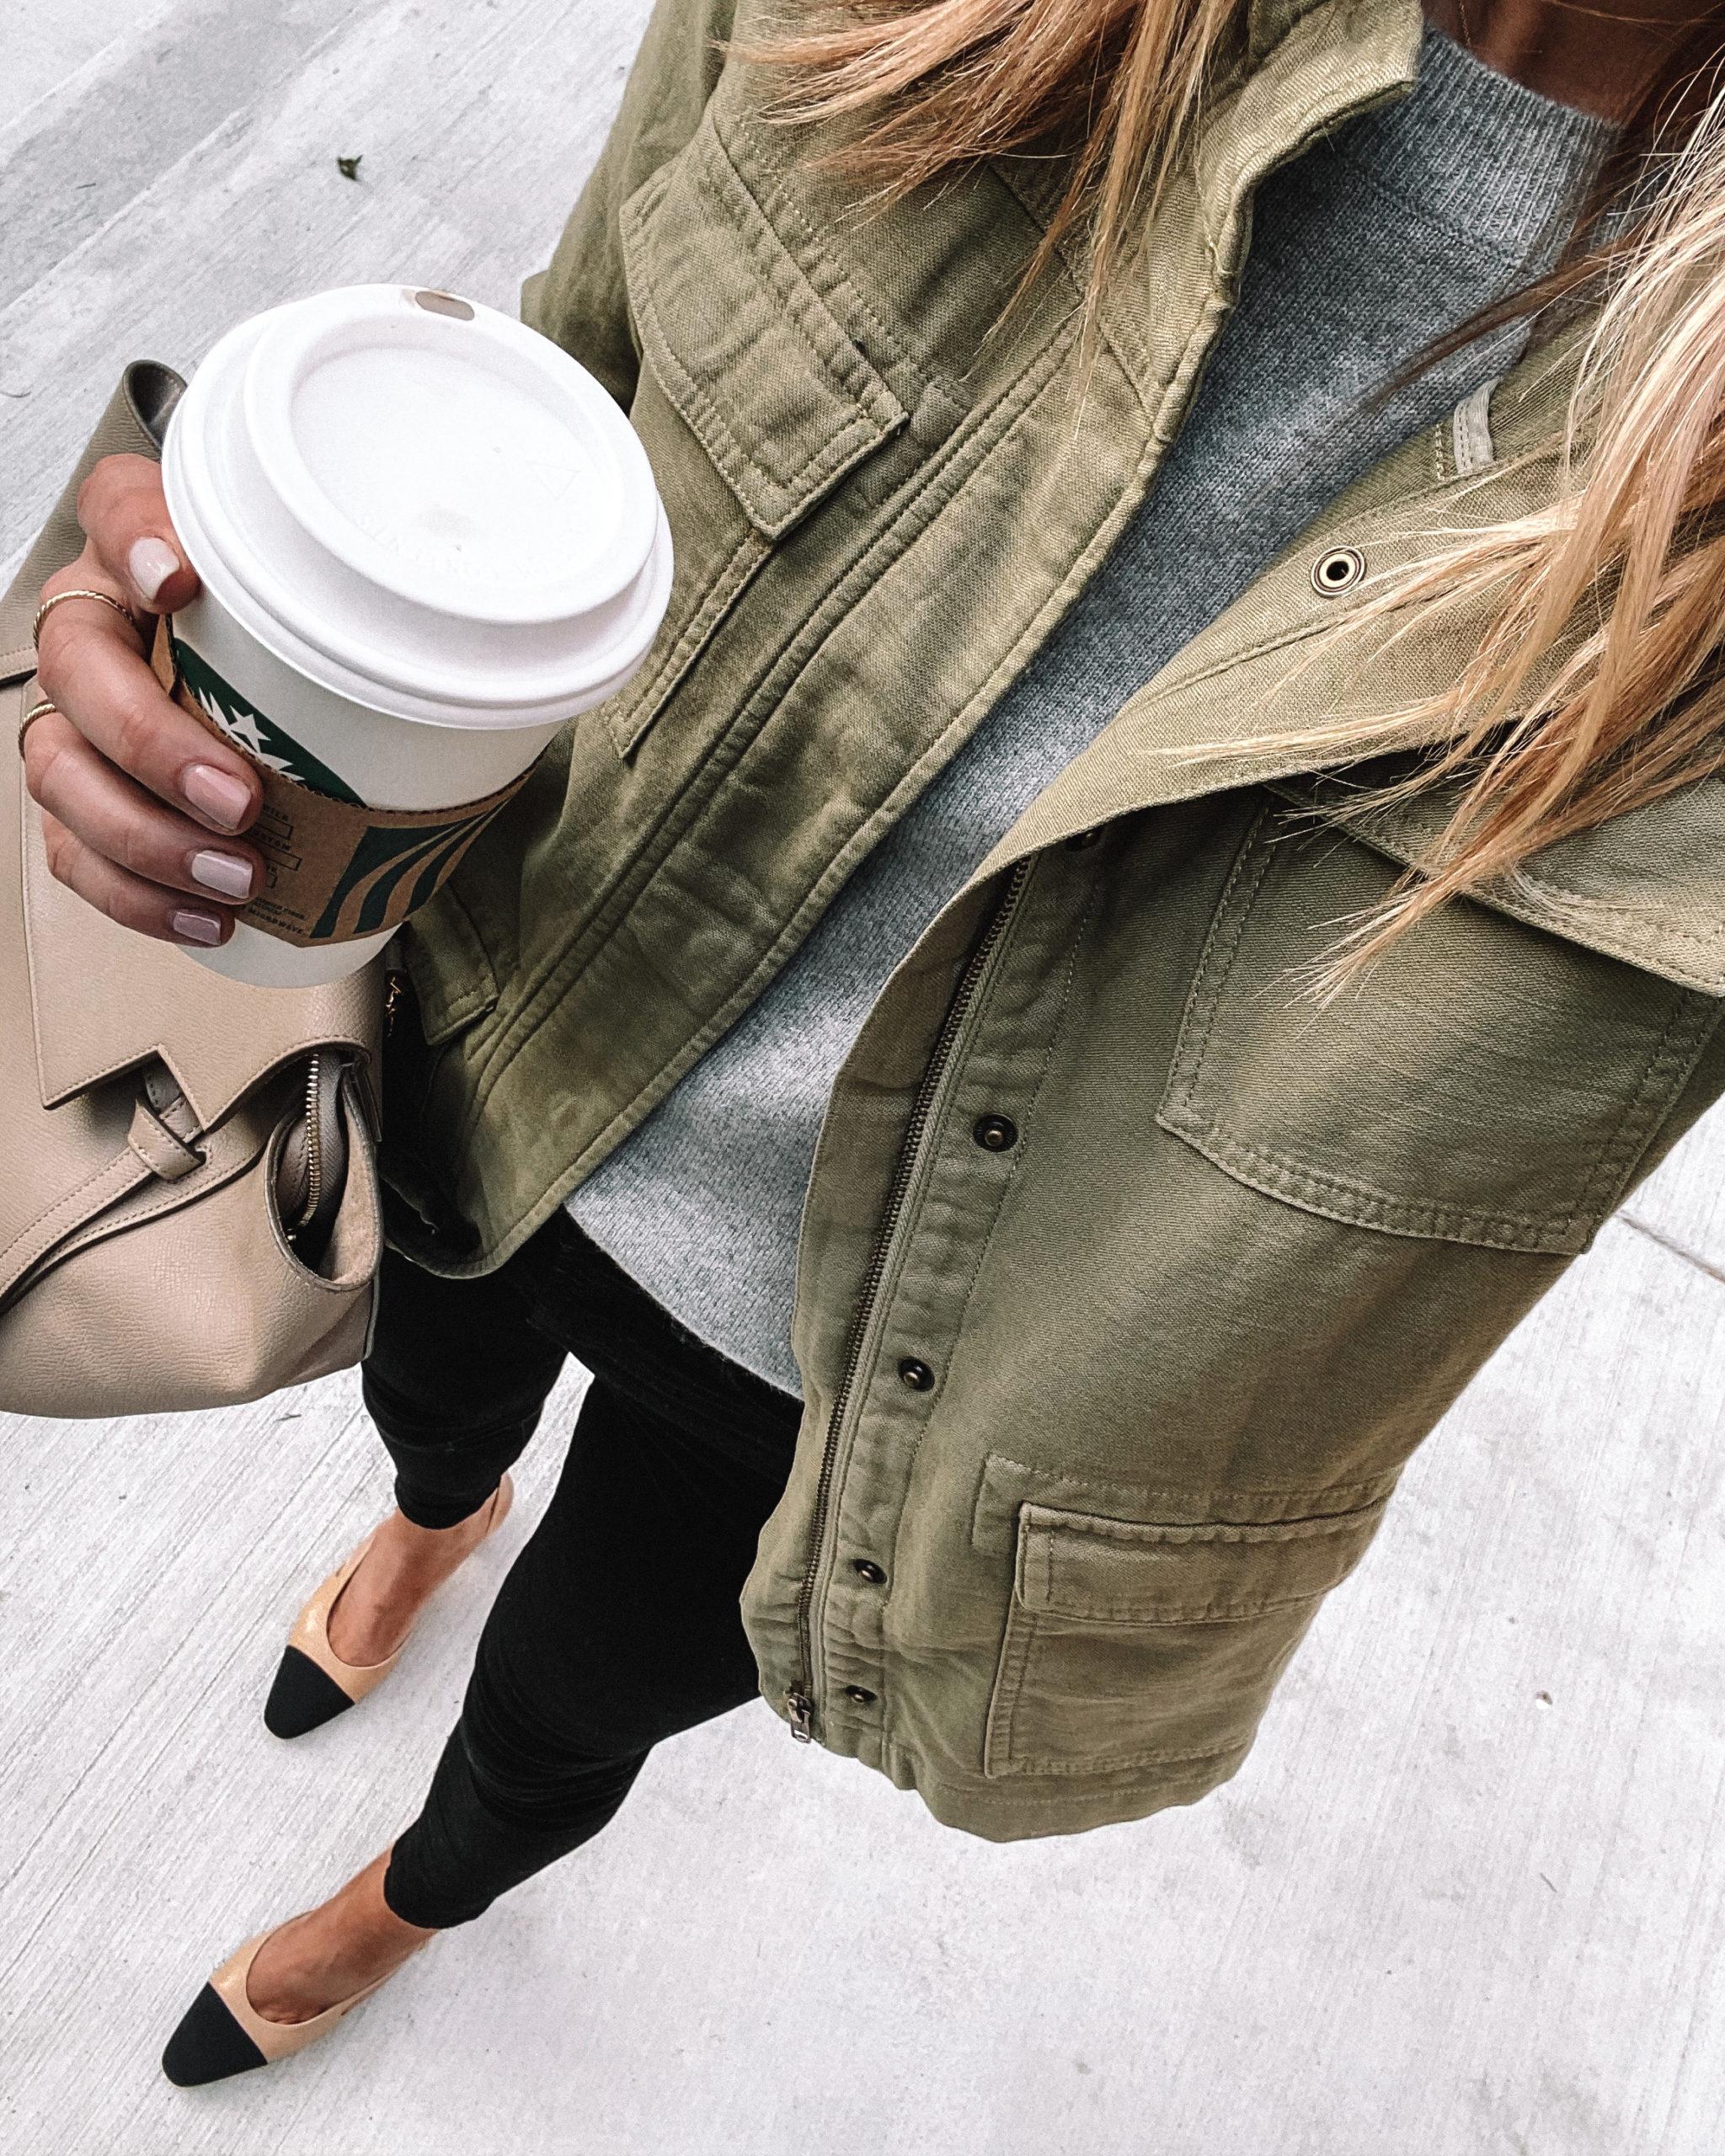 Fashion Jackson Green Utility Jacket Grey Sweater Black Skinny Jeans Chanel Slingbacks